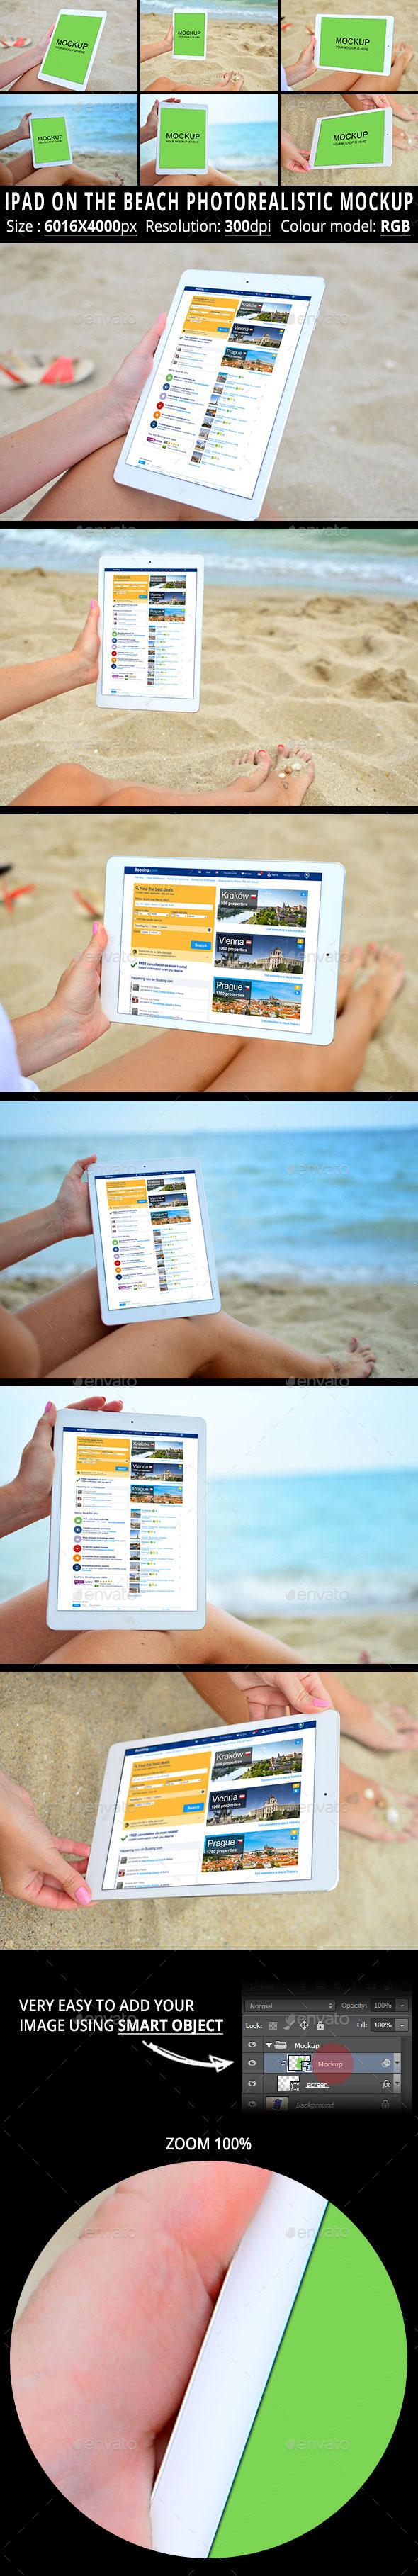 iPad On The Beach Photorealistic Mockup - Mobile Displays